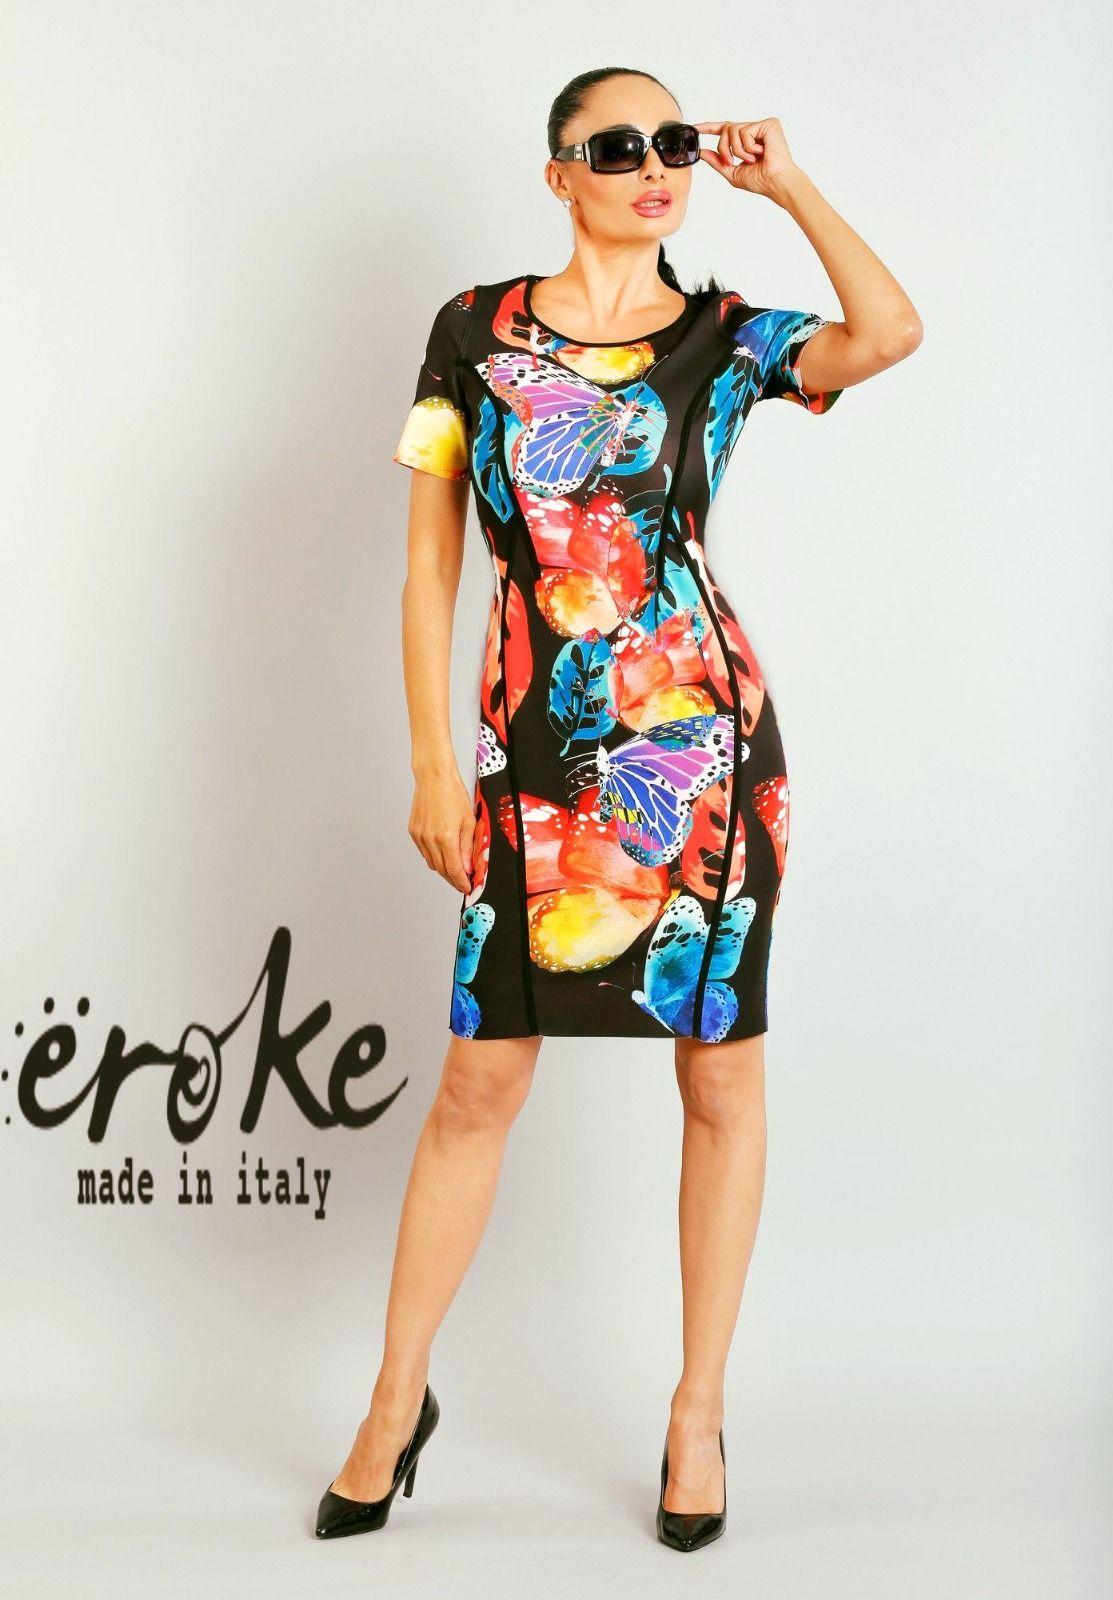 Eroke Lookbook 2018